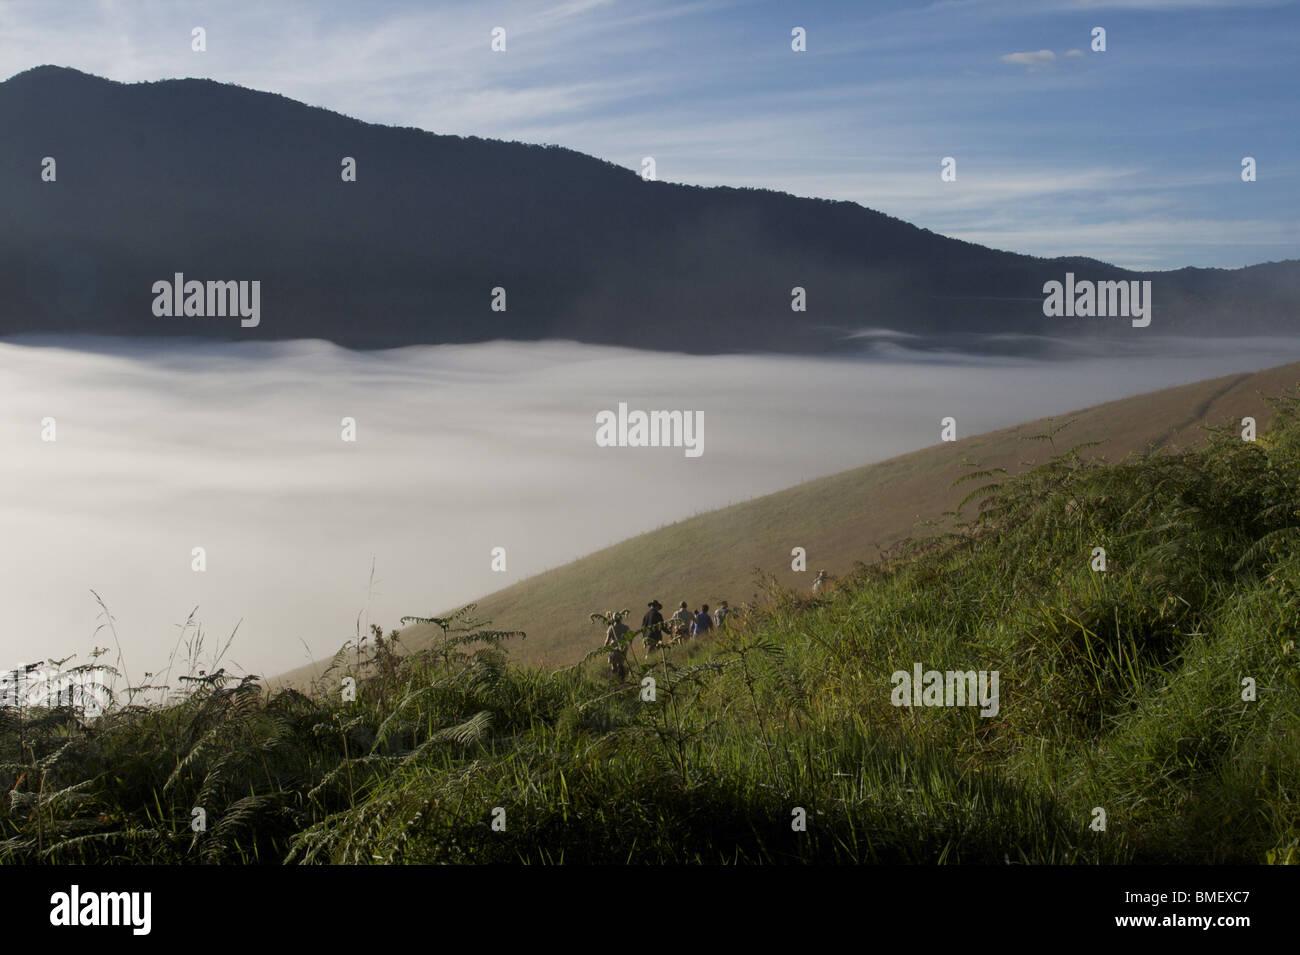 Trekkers at Myola Basin, along the Kokoda Trail, PNG - Stock Image